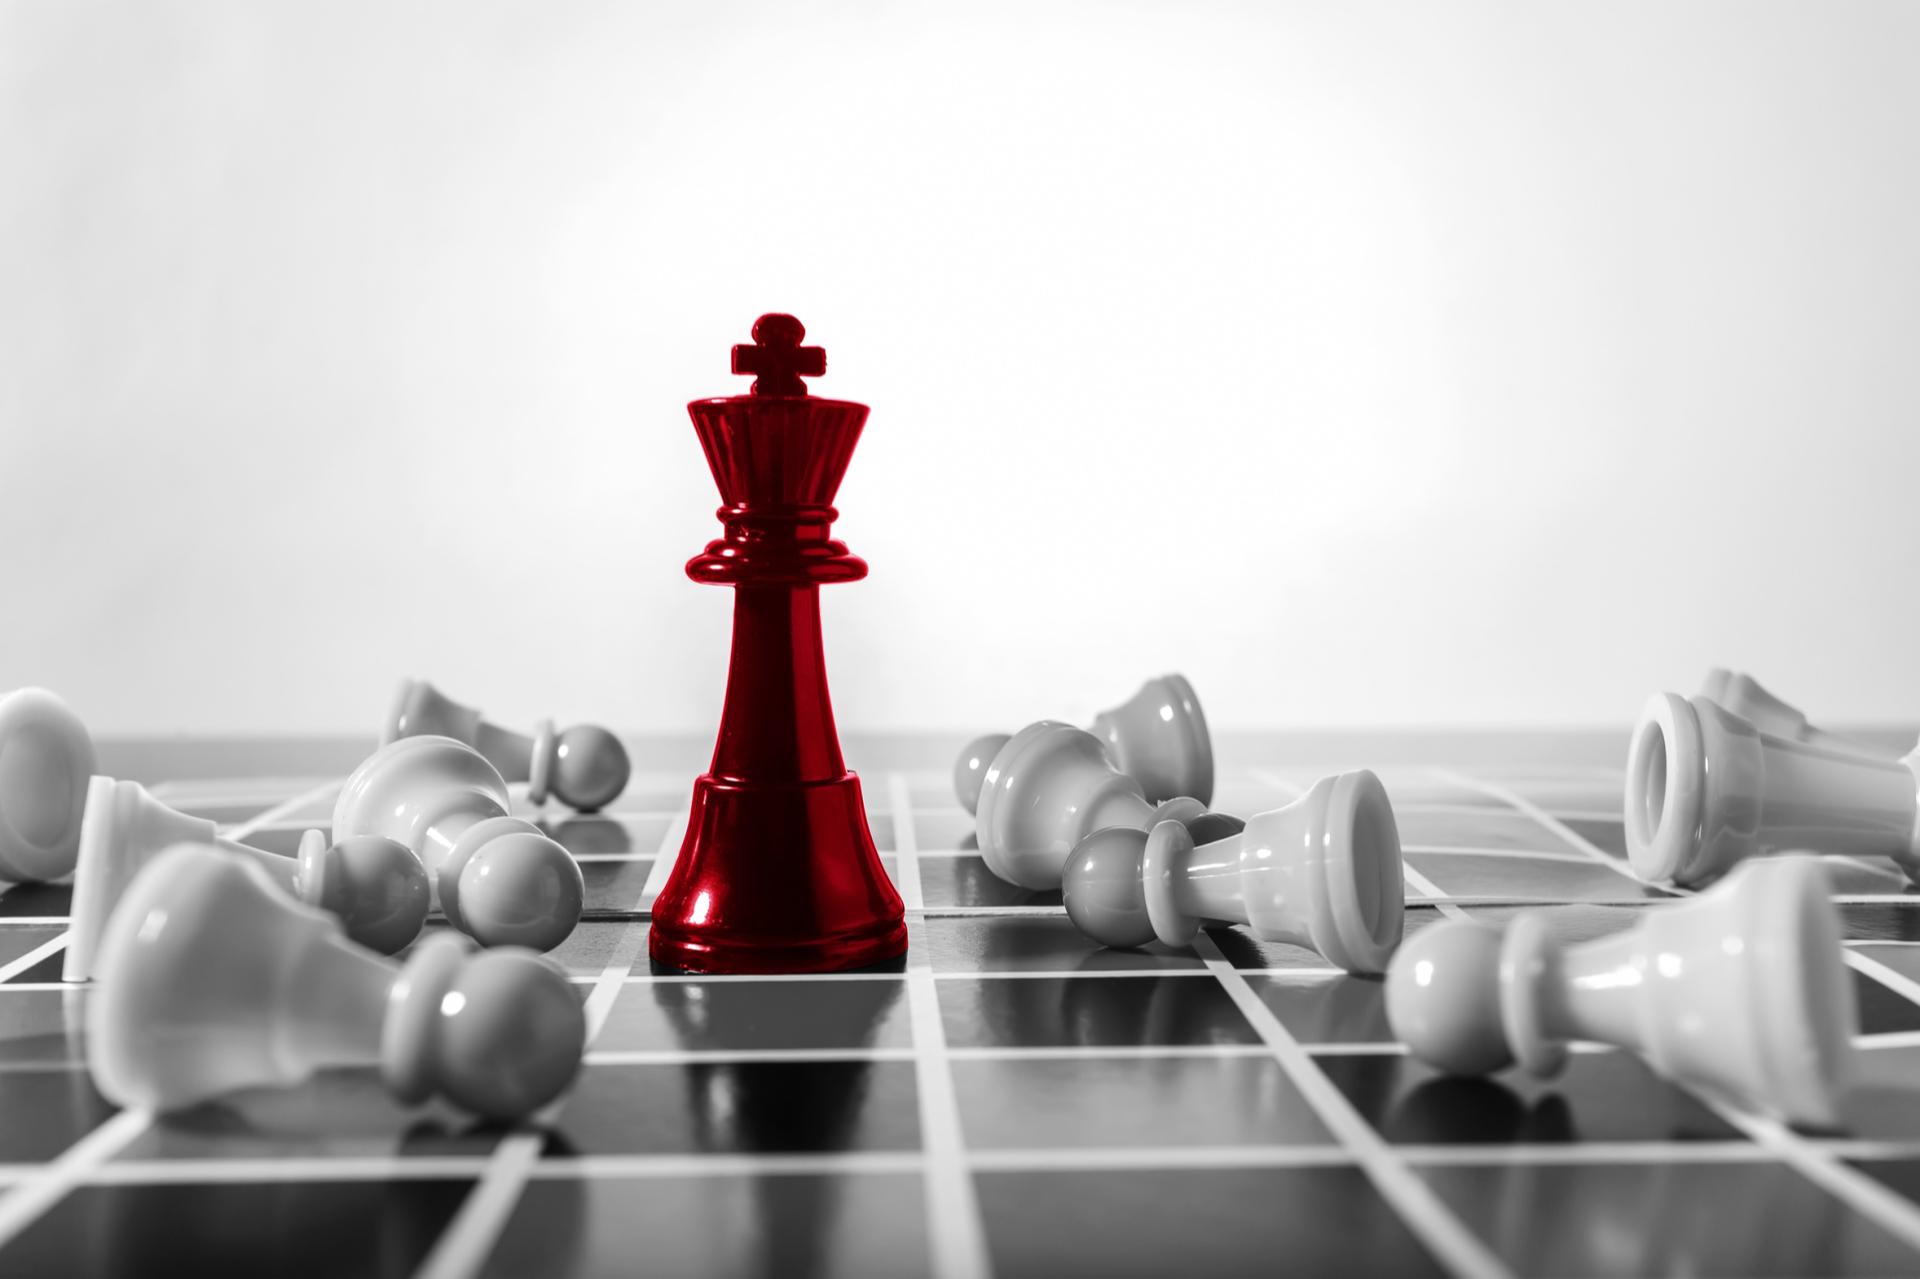 Mentaltraining - die Königsdisziplin im Coaching!